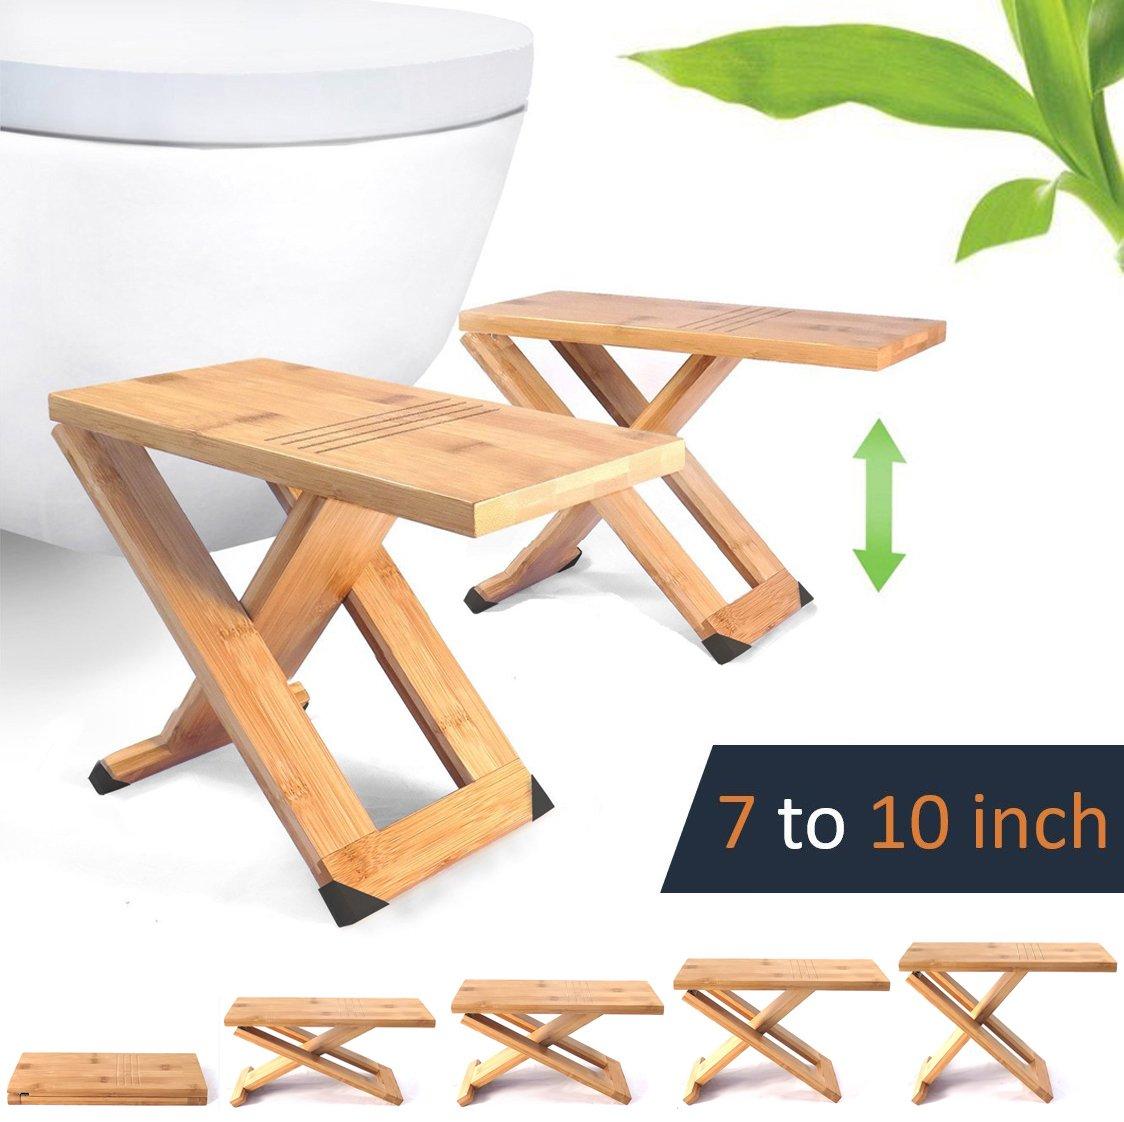 Squat Toilet Stool by Relaxx - Folding Bamboo Wood Squatting Stools - 7'', 8'', 9'', 10'' Adjustable - The Original Portable Bathroom Foot Stool (One Pair) - Black anti-slip